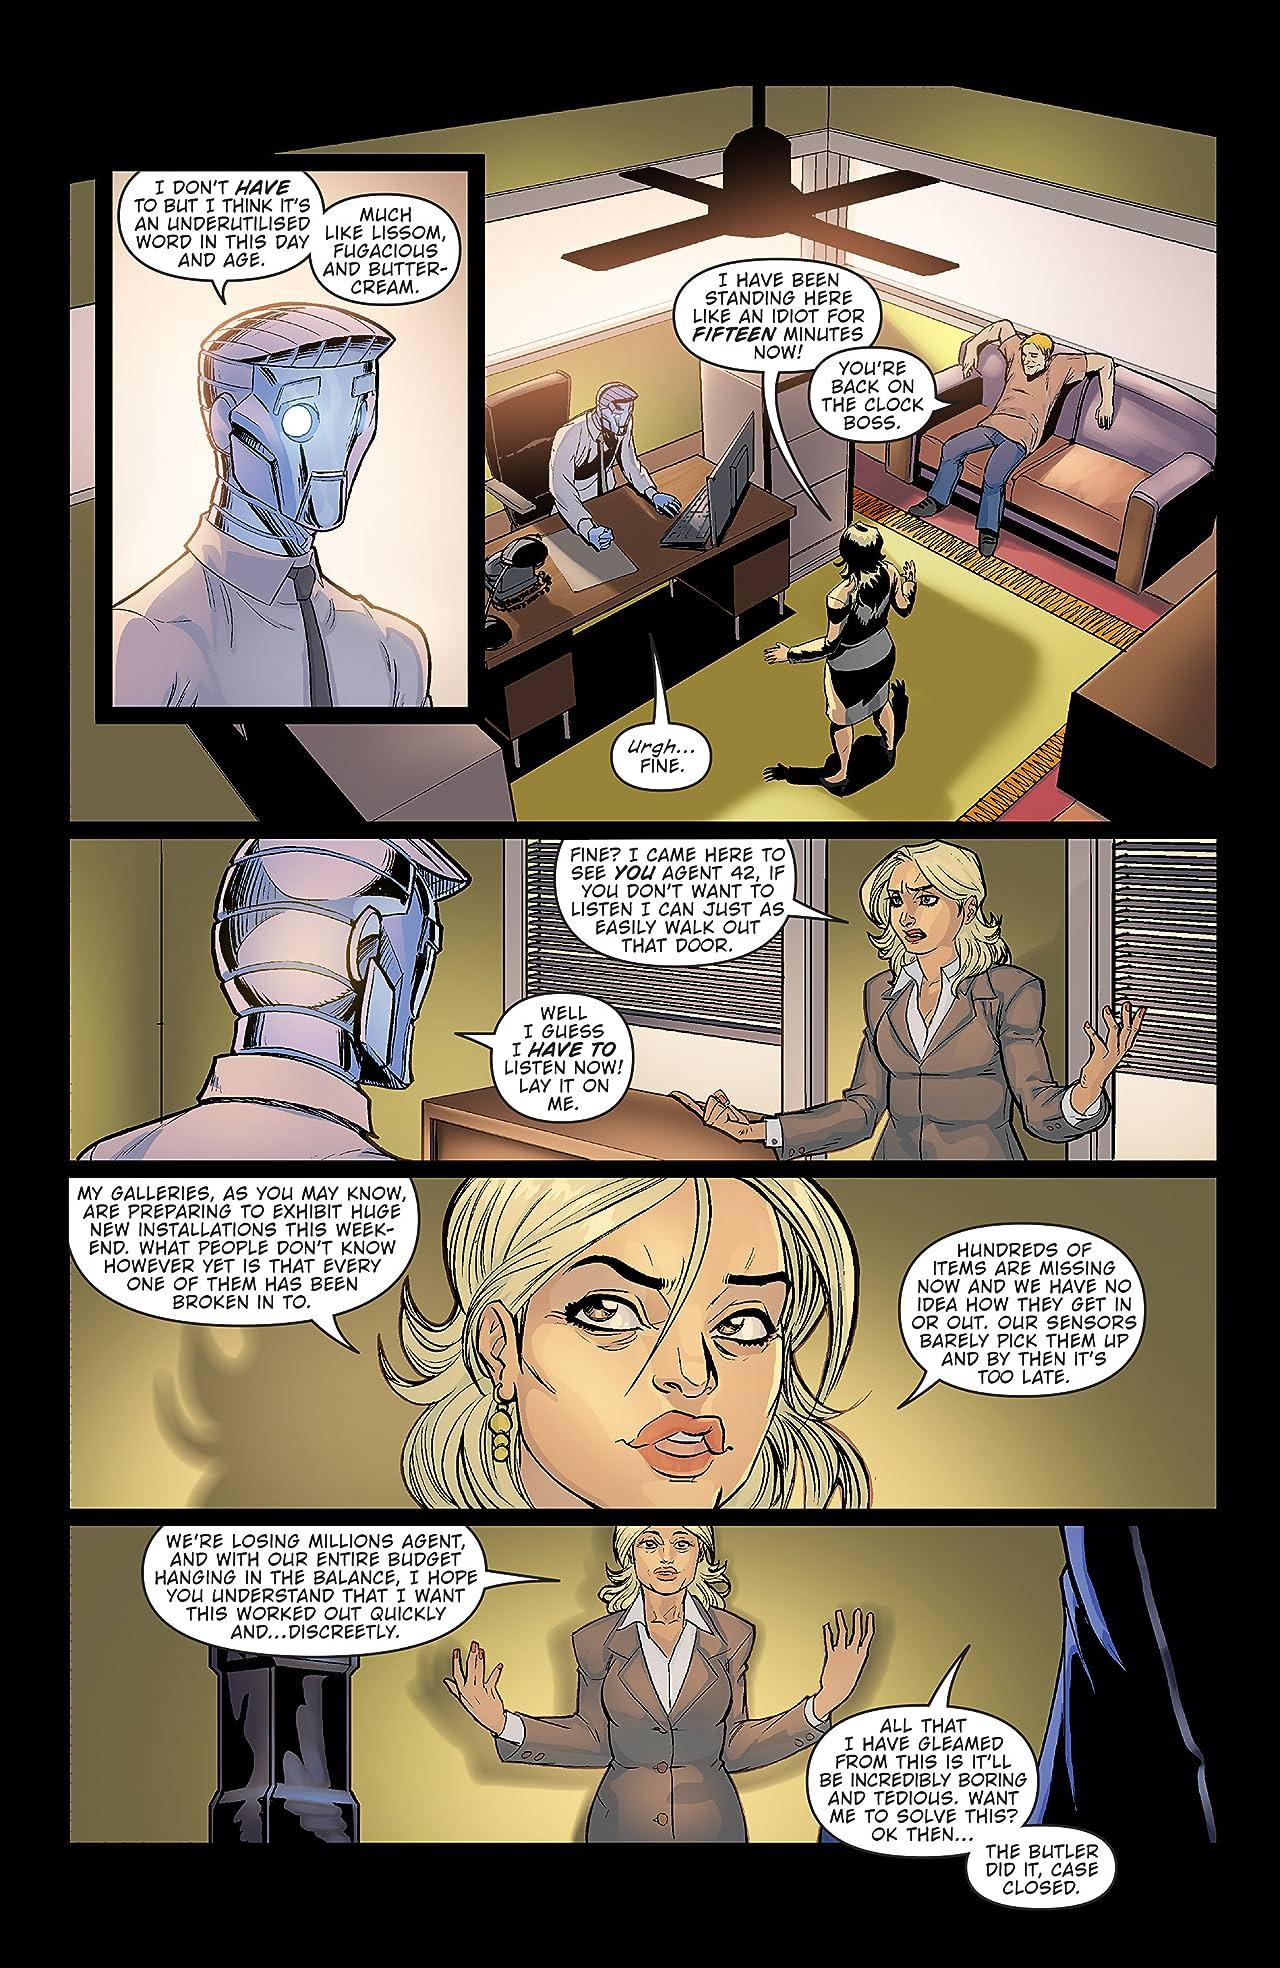 Agent 42 #2 (of 4)